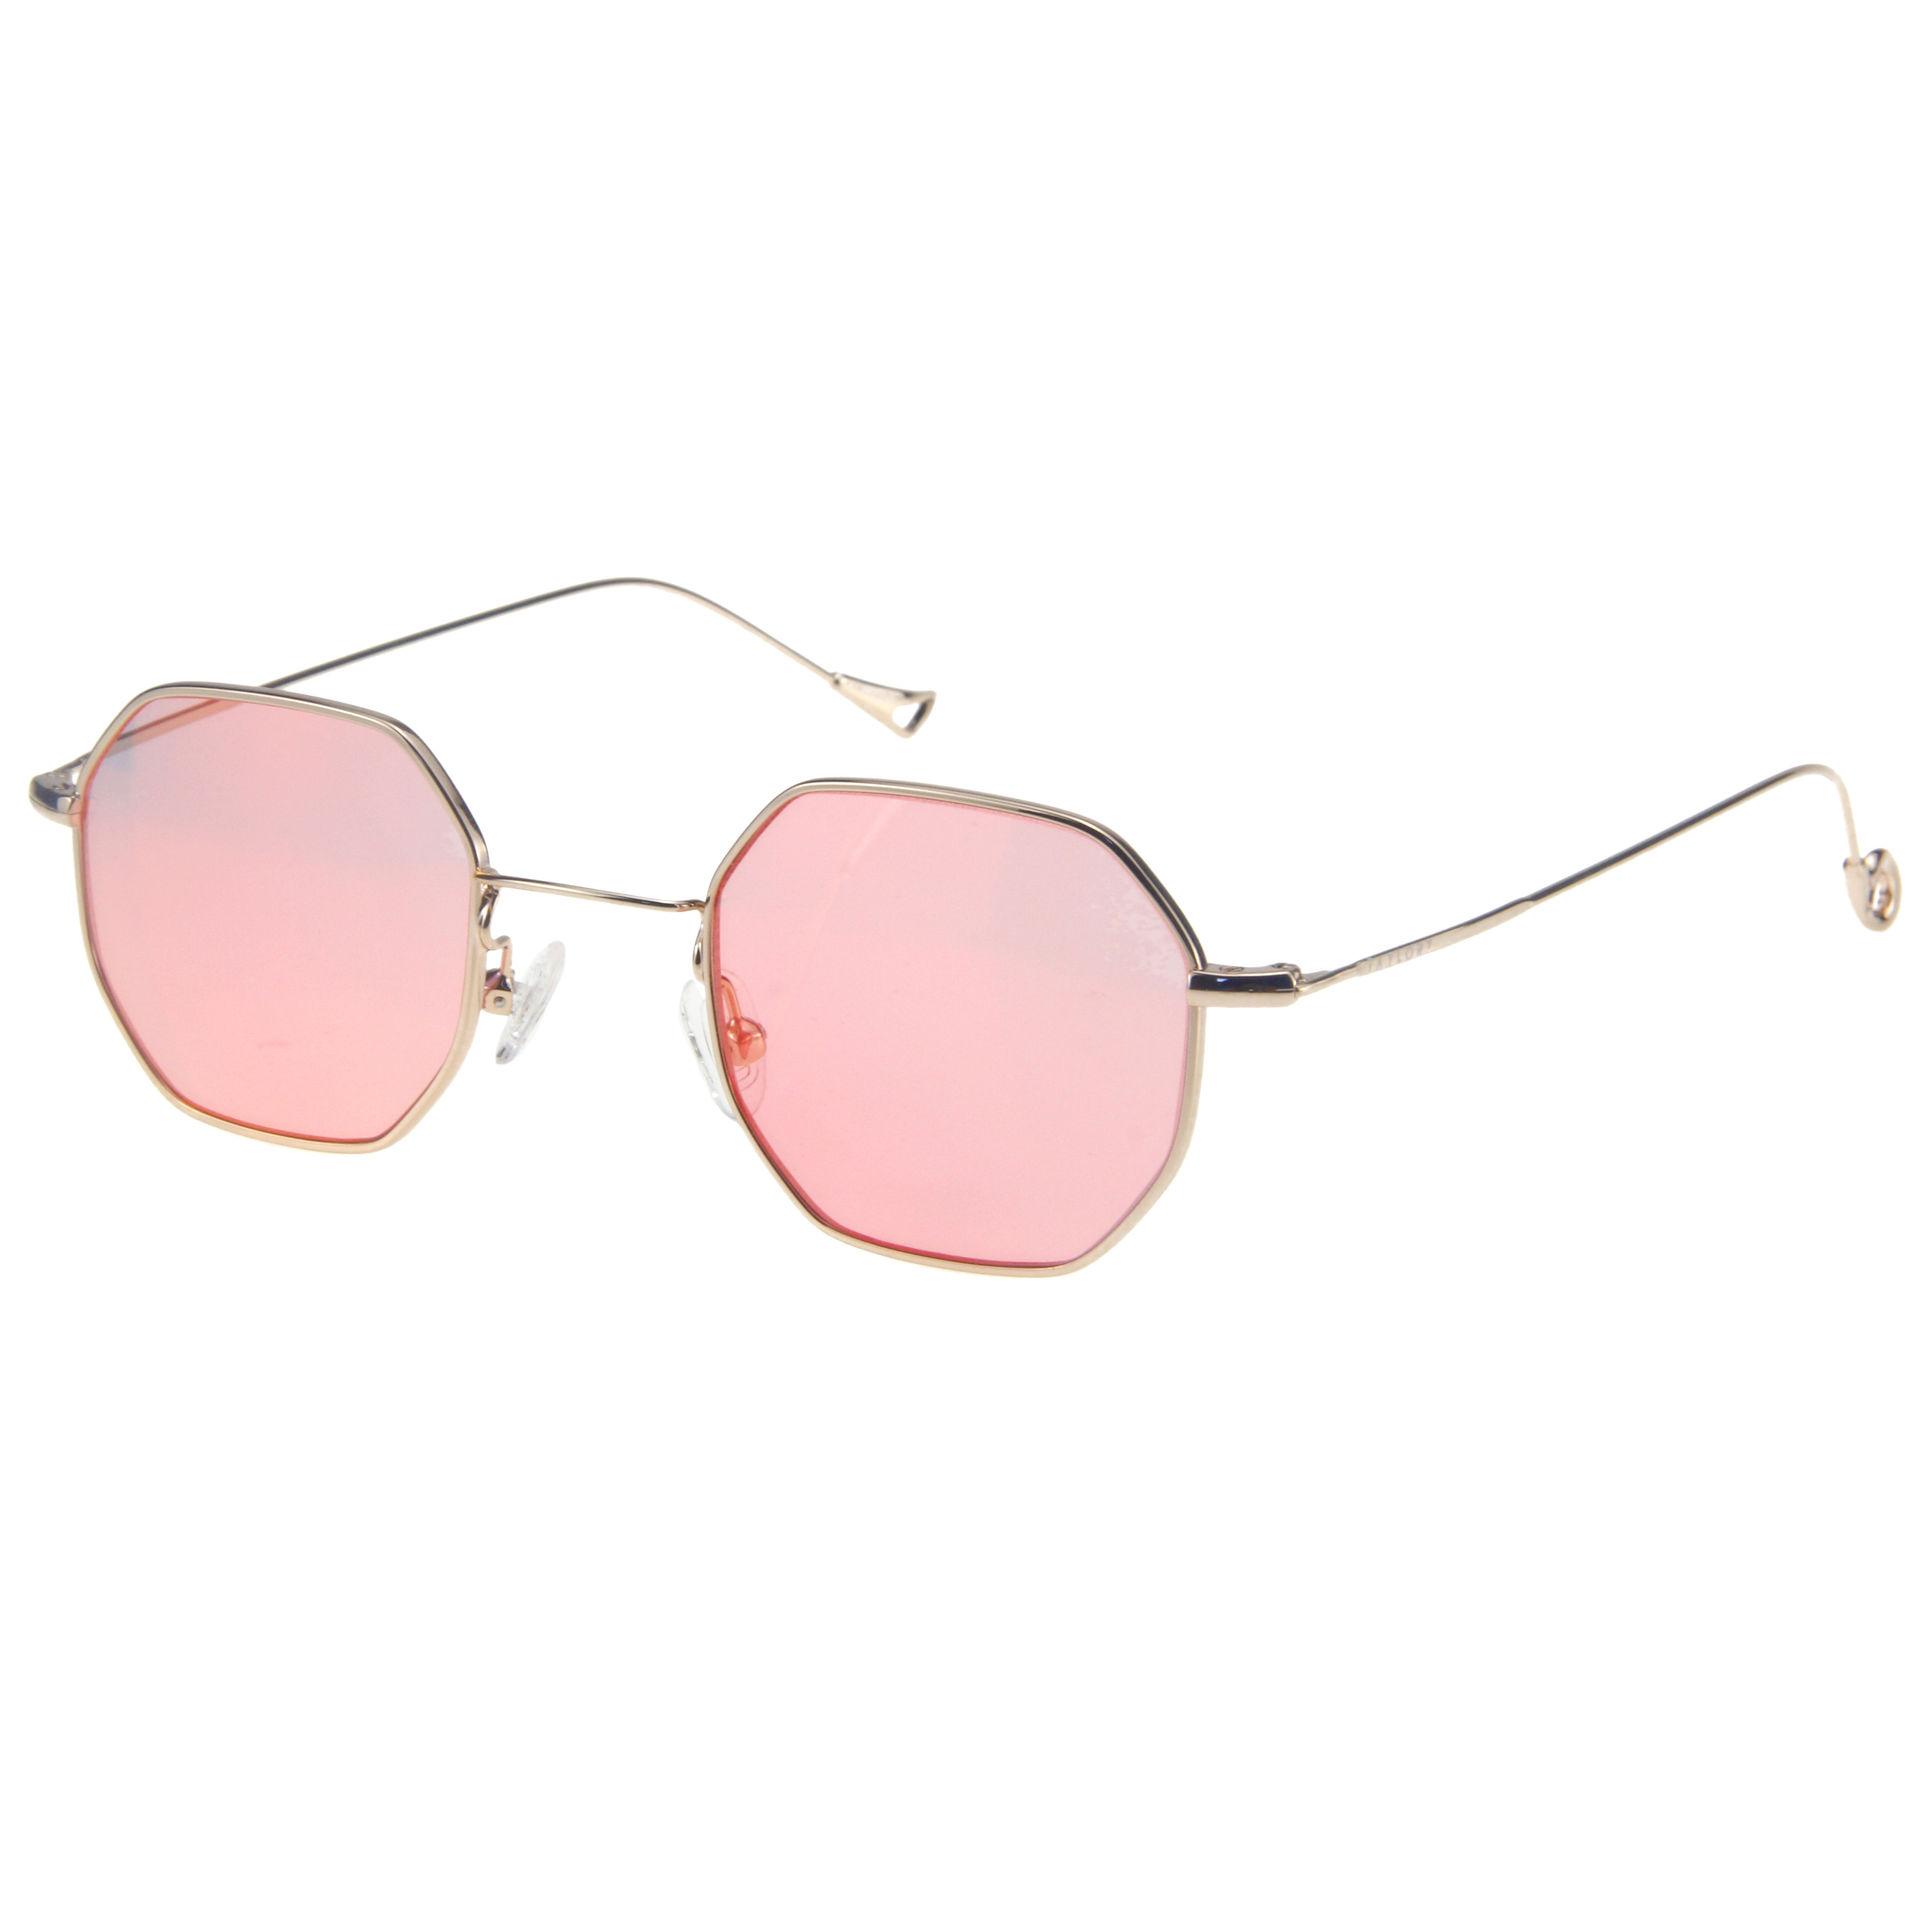 Eugenia Newest 2020 Women Fashion Square Sunglasses